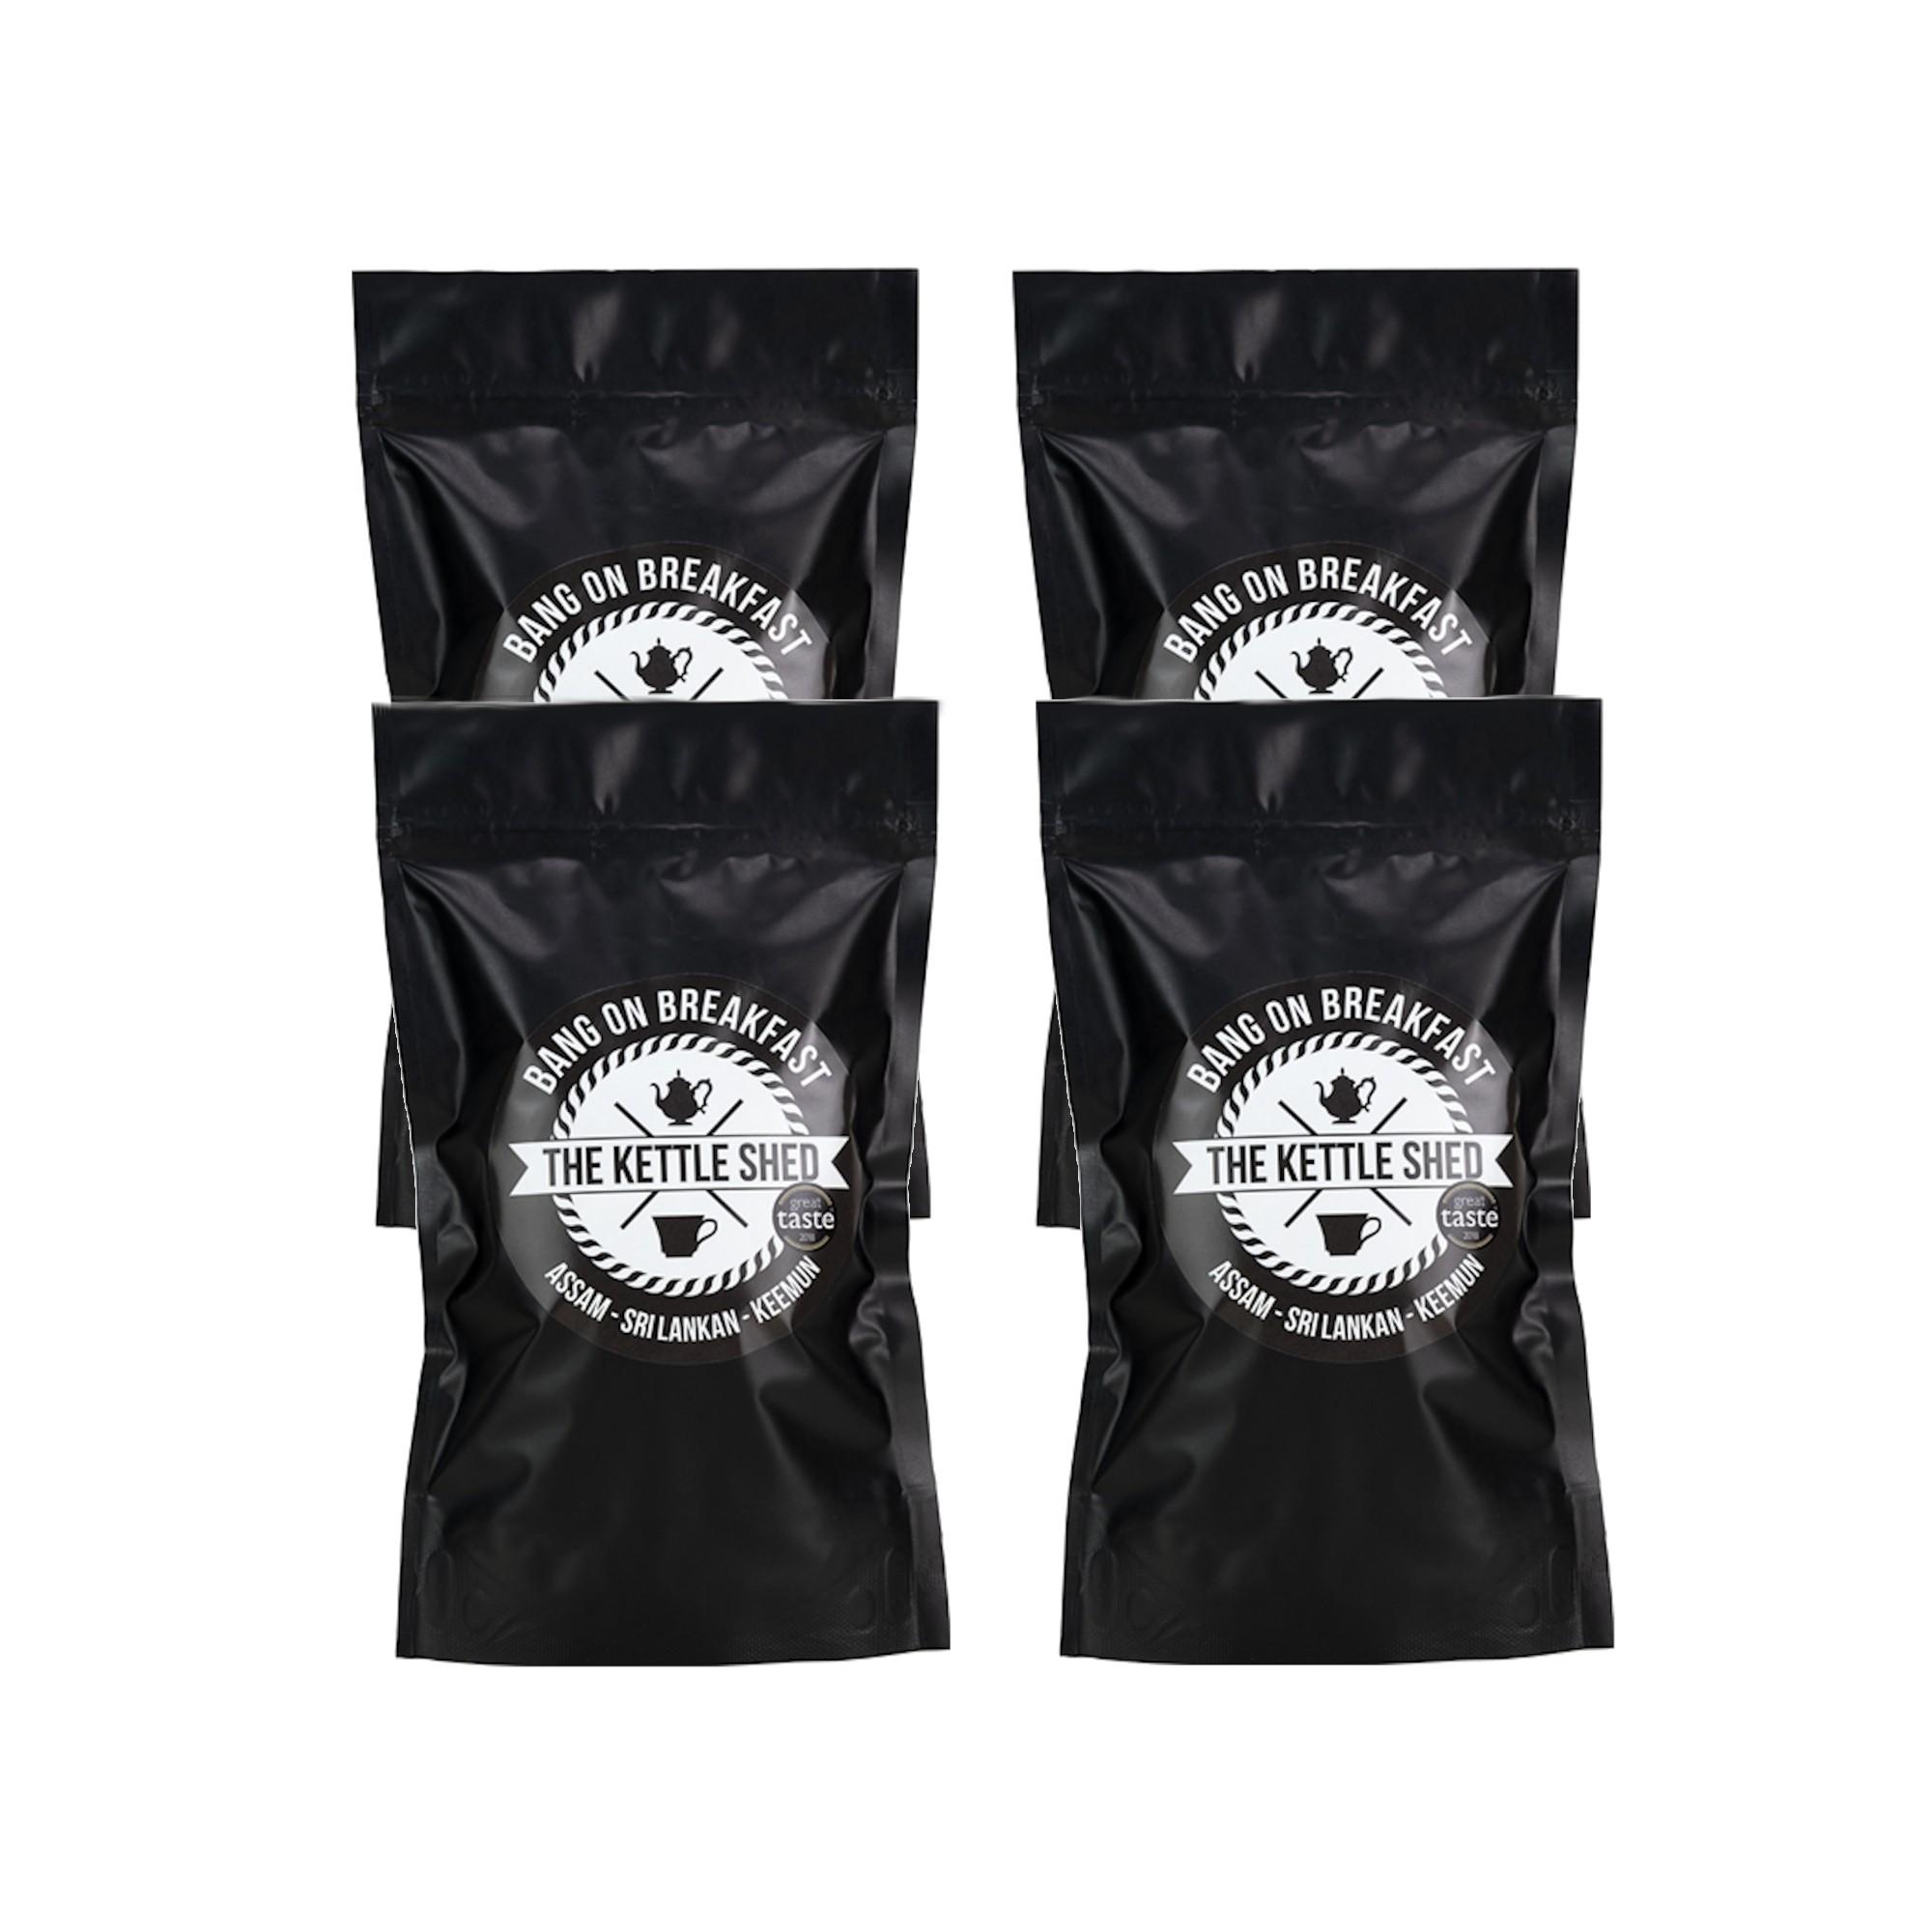 Bang on Breakfast 15x Teabags (4 pack)